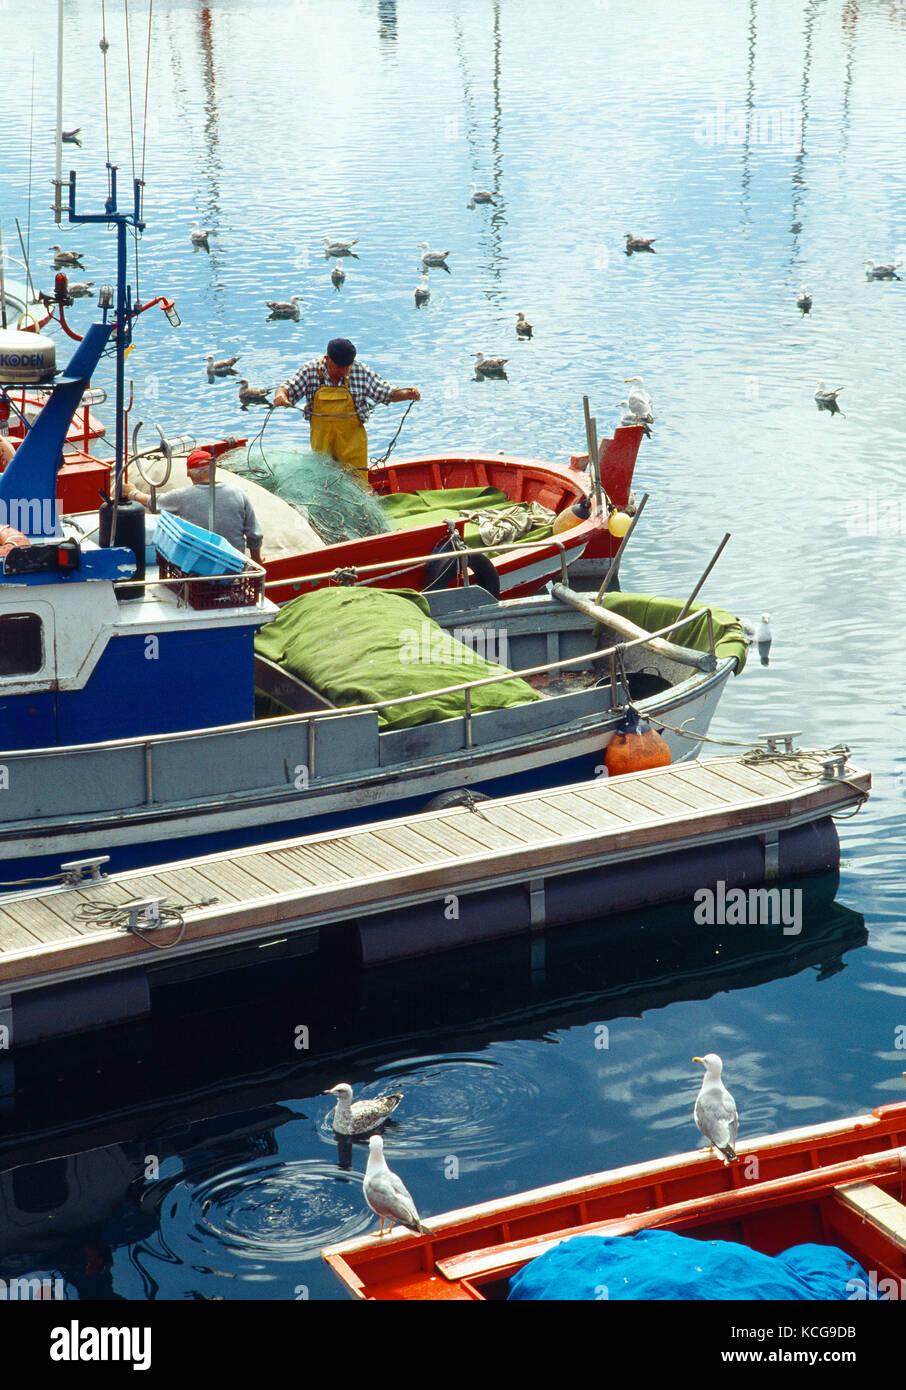 Fishermen working on their fishing boat. Harbour, La Coruña, Galicia, Spain. - Stock Image